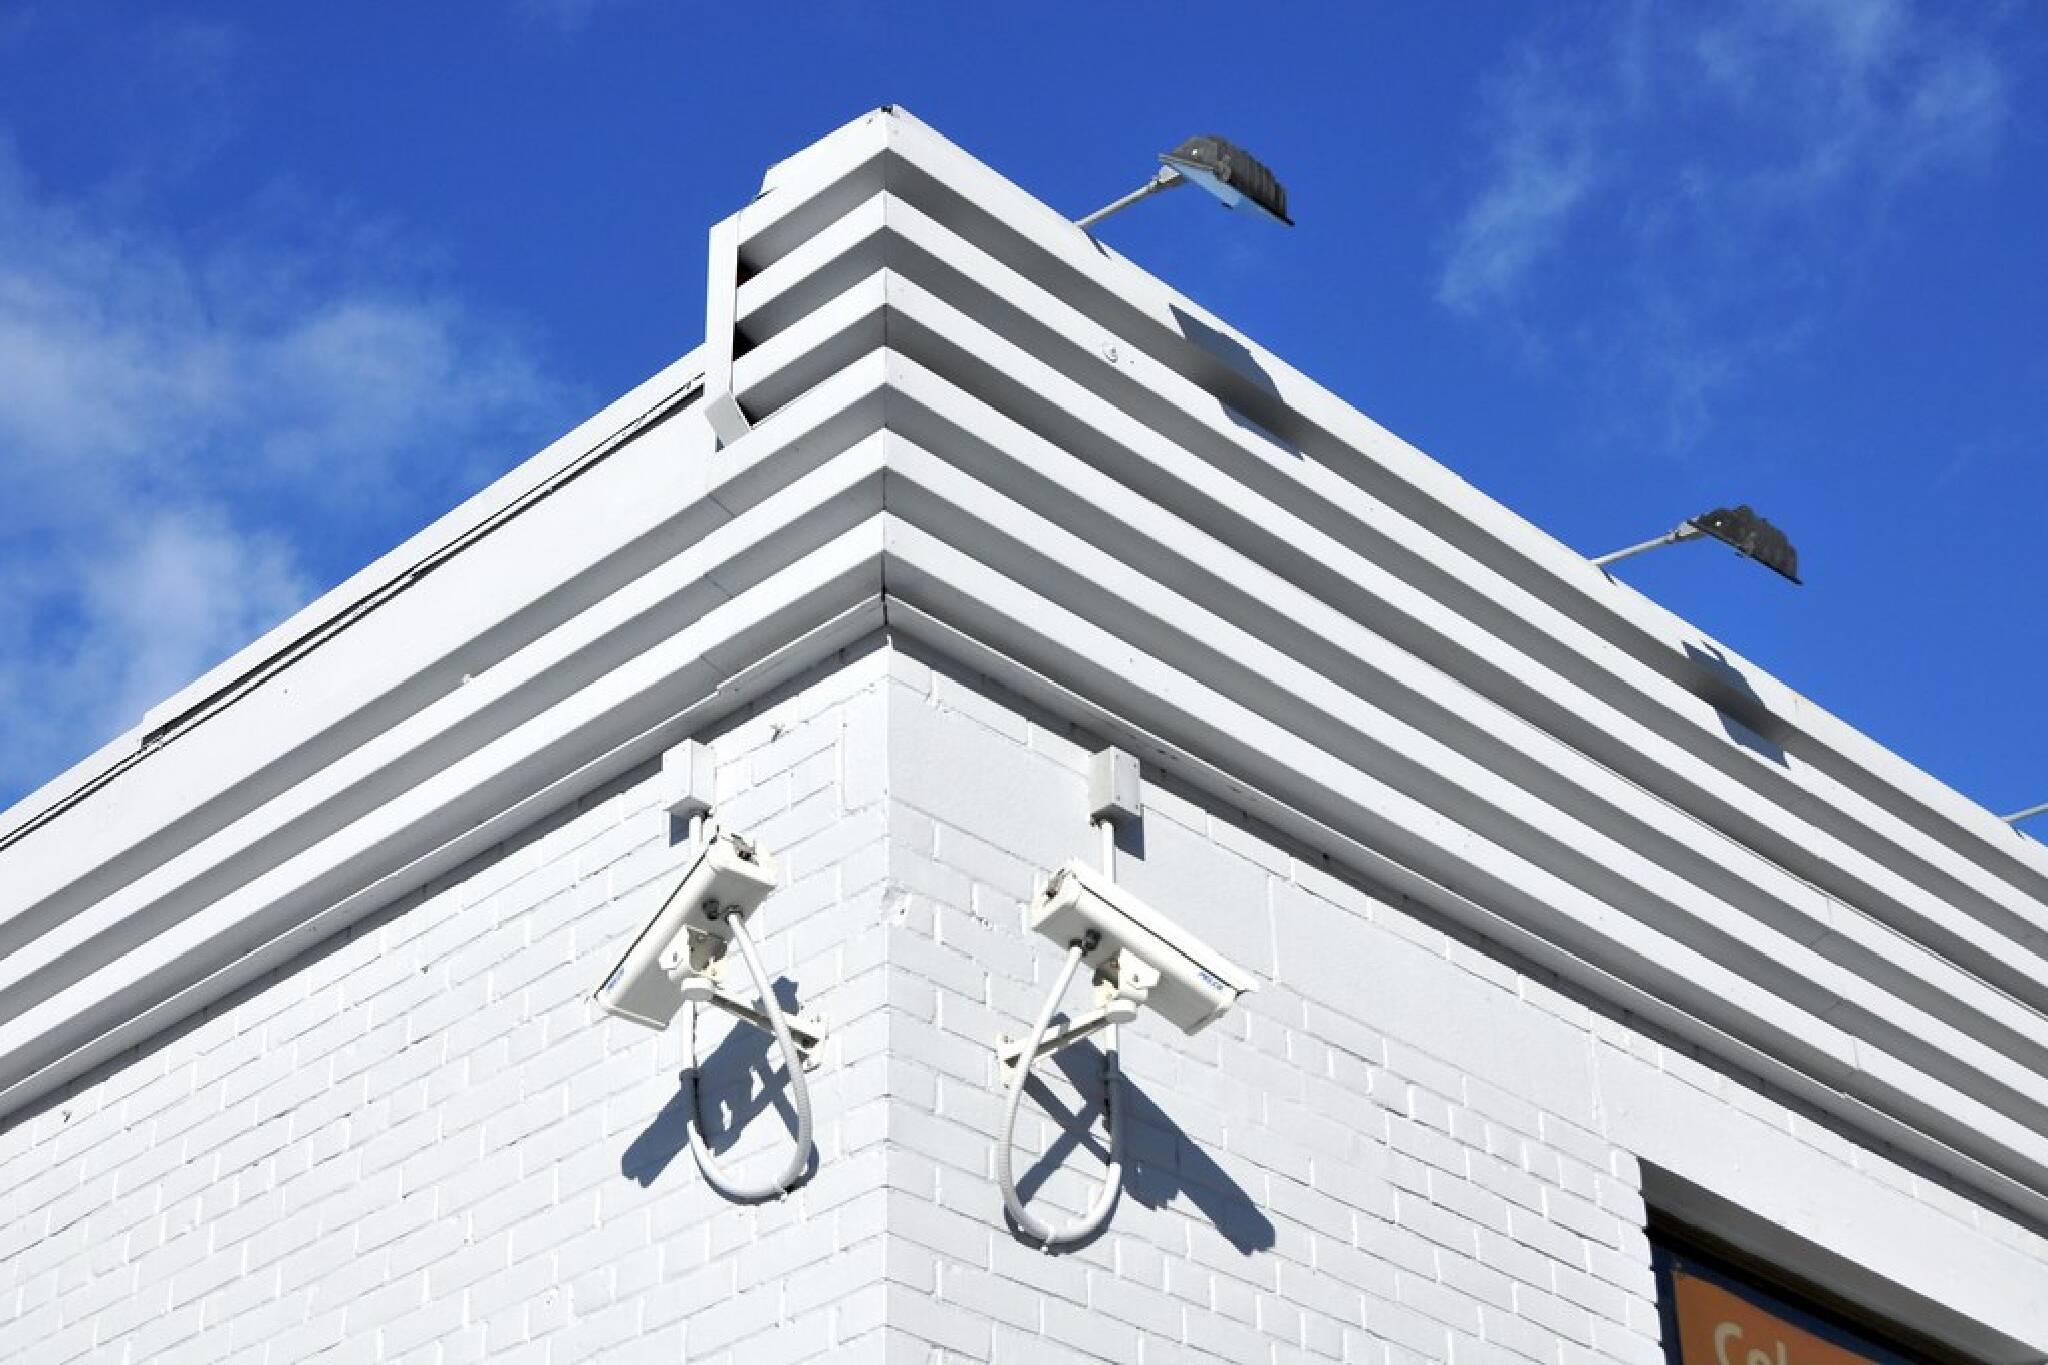 chinatown cctv cameras